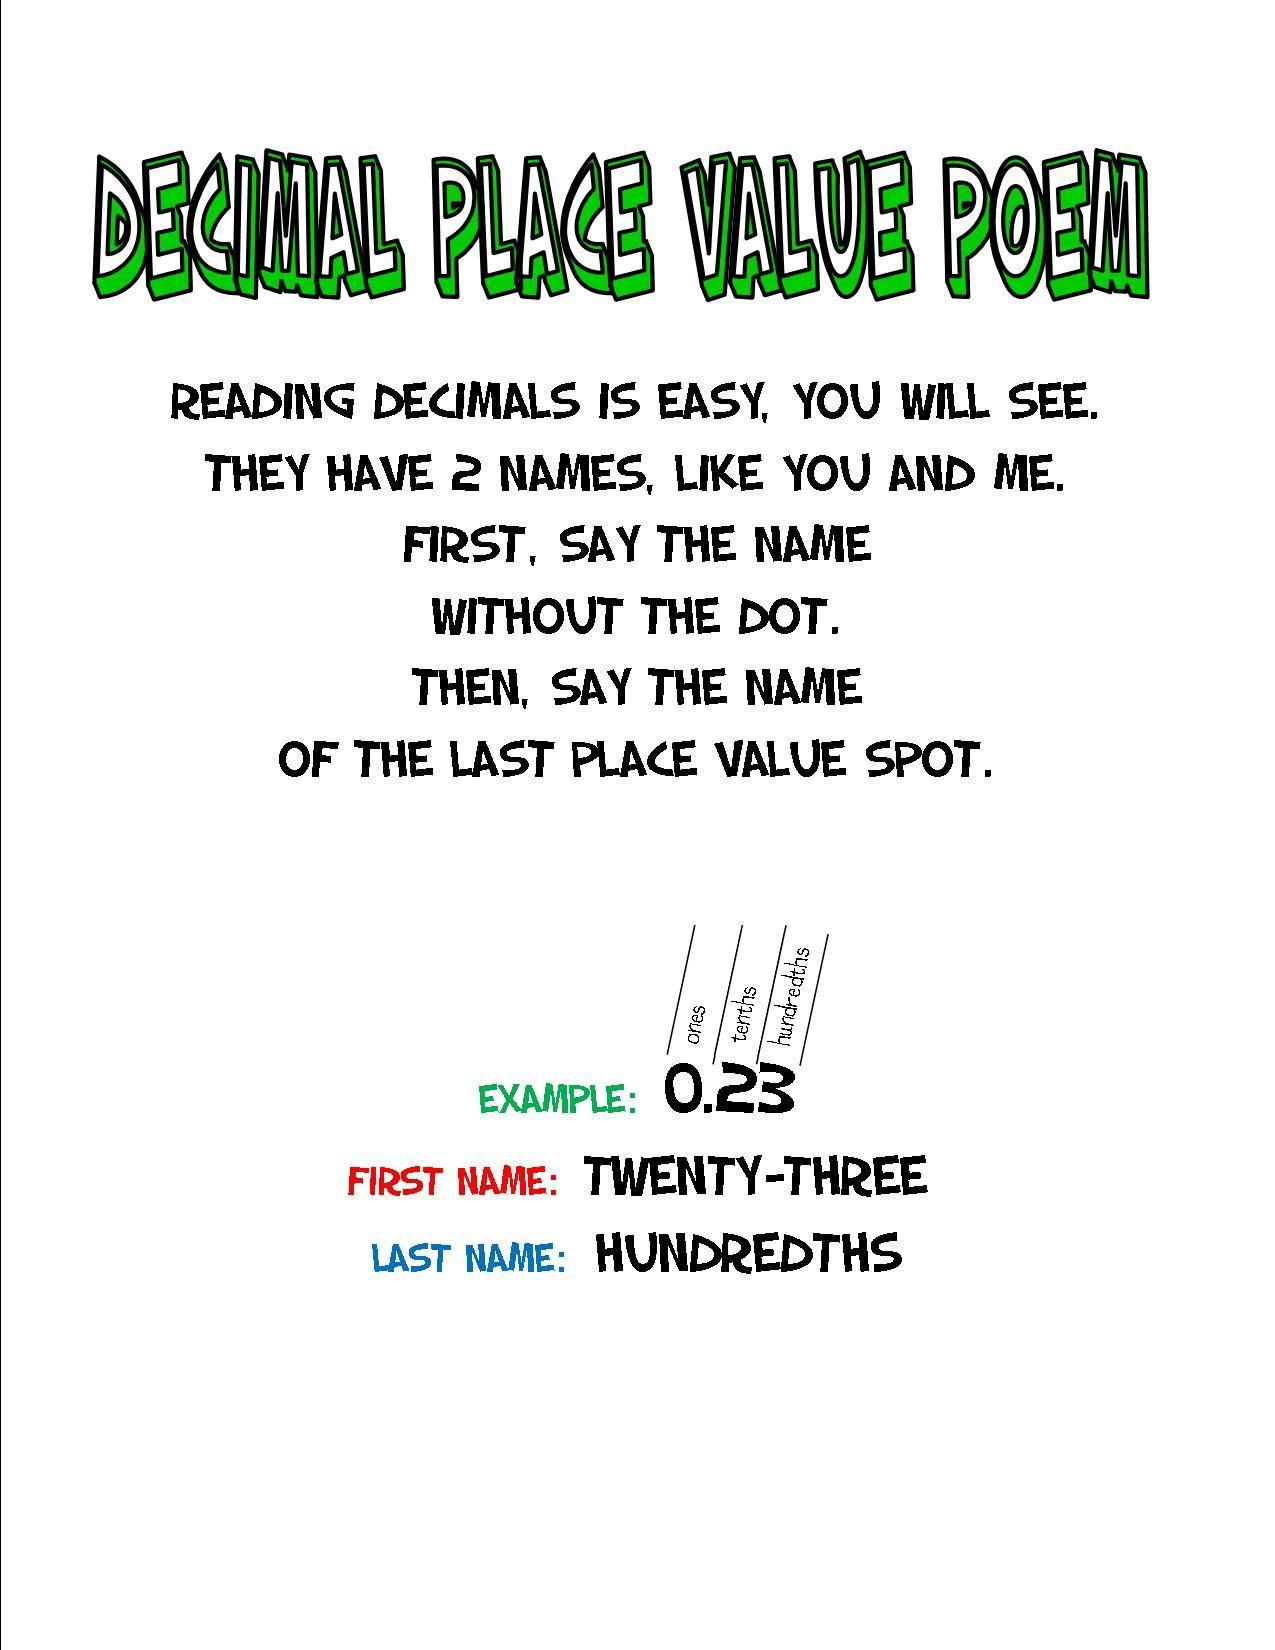 Decimal Place Value Poem